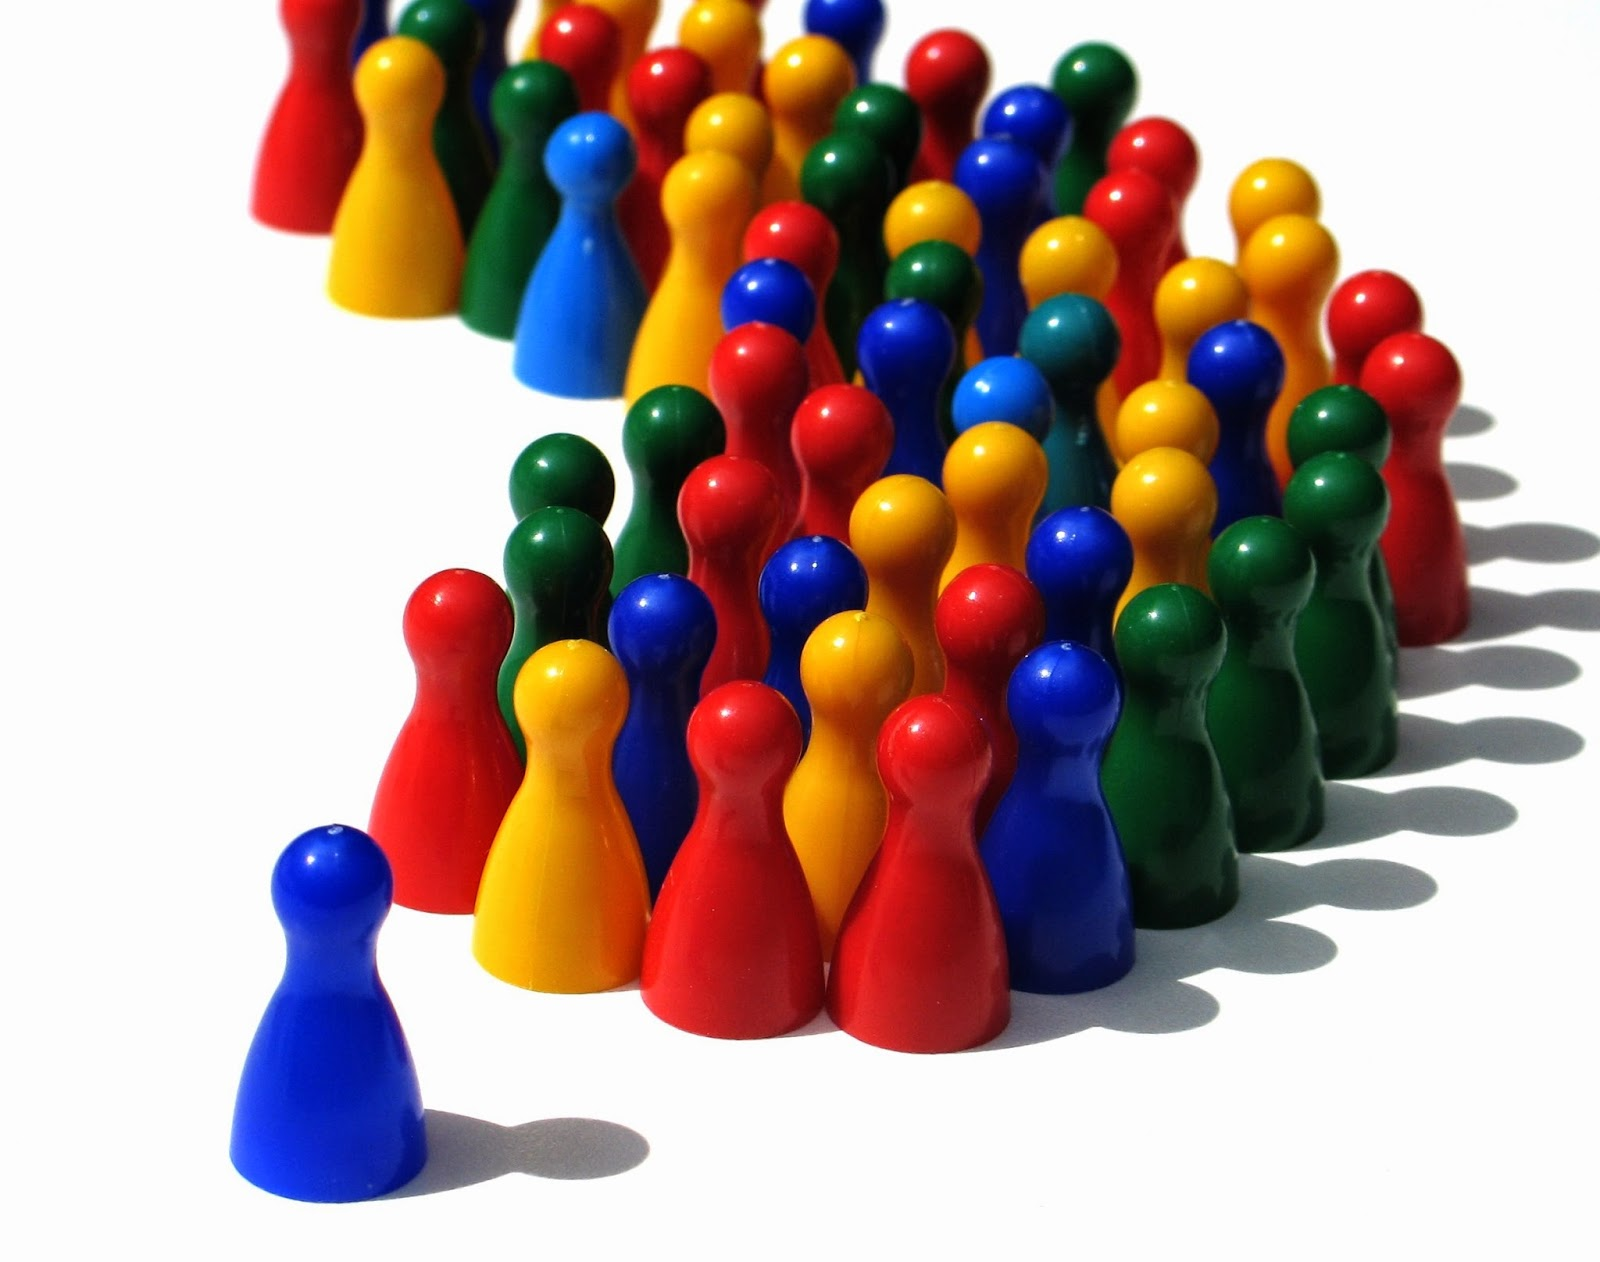 Leadership Promises - The Longest Way Is A Short Cut